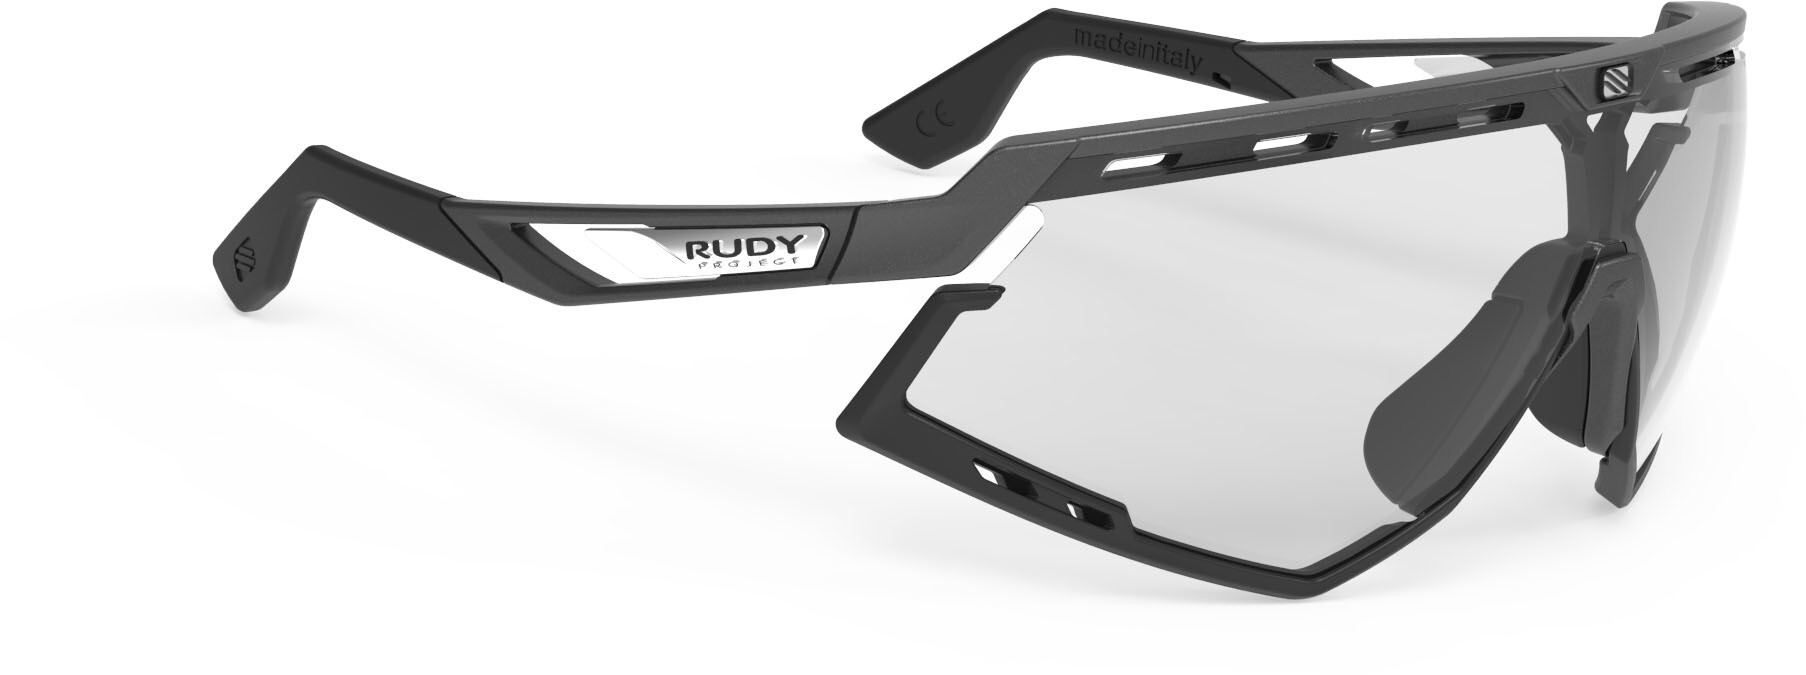 1c0feb28d9 Rudy Project Defender Graphene Glasses Graphene Grey Black - ImpactX  Photochromic 2 Black